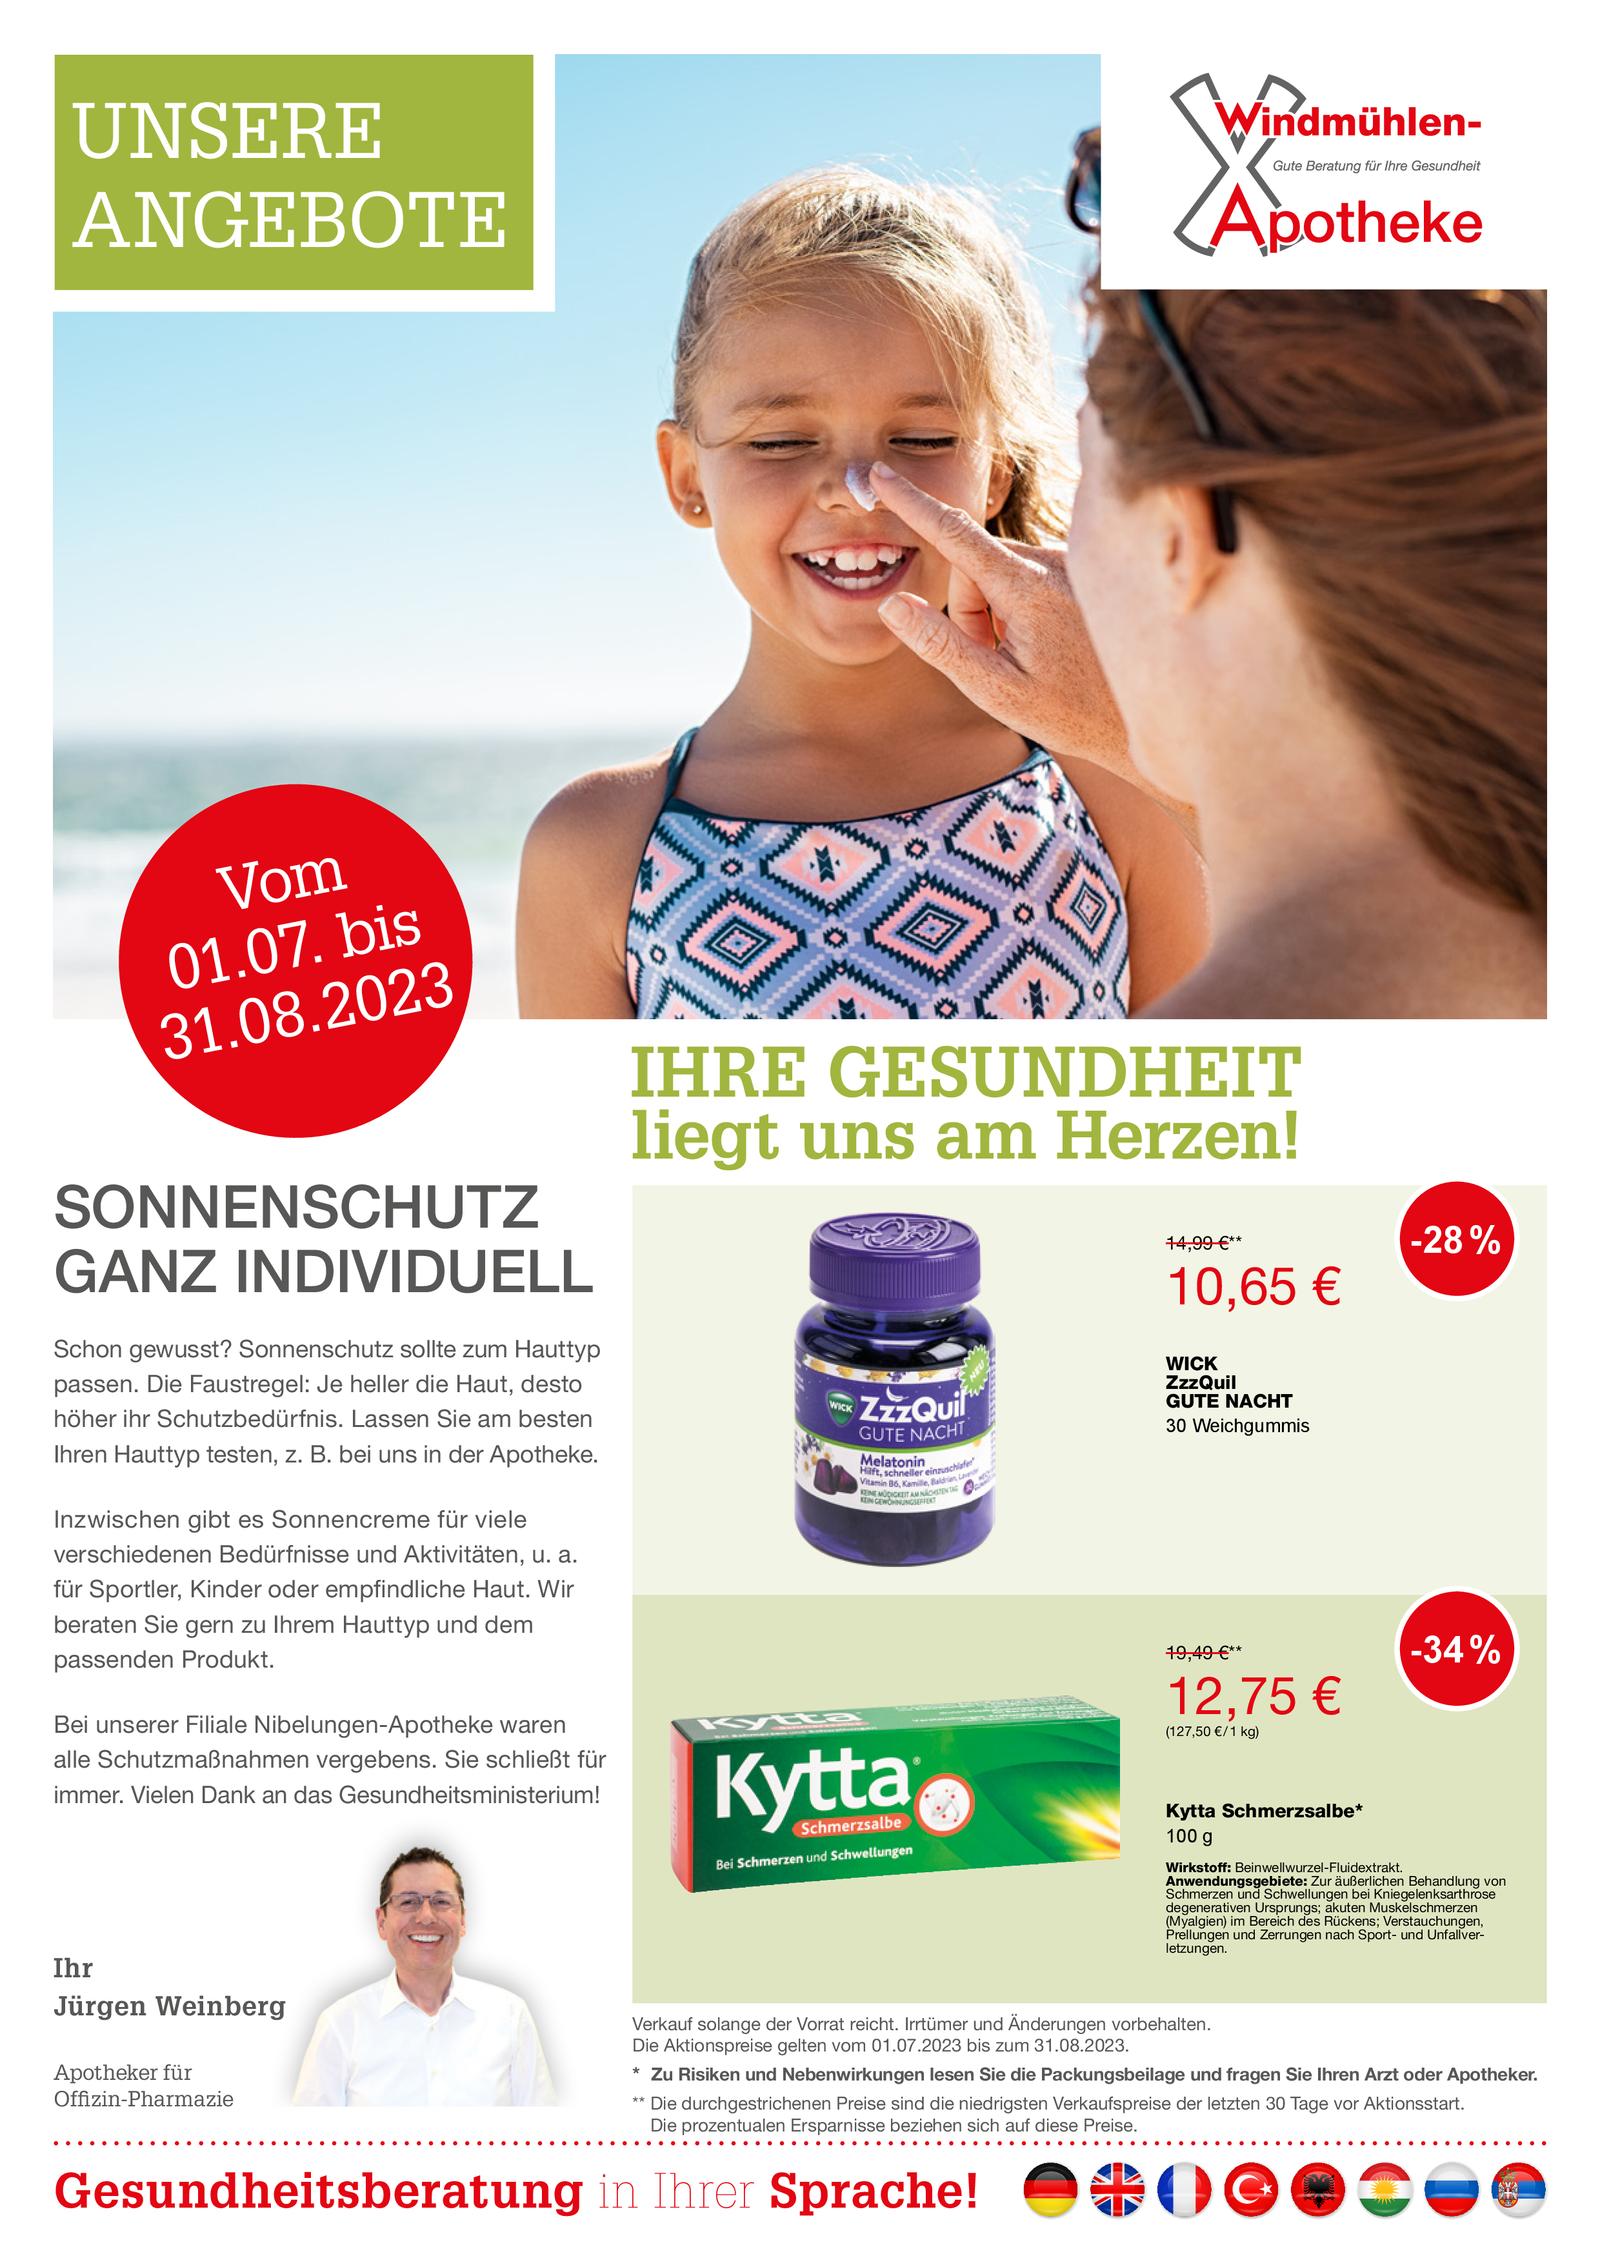 https://mein-uploads.apocdn.net/594/leaflets/594_flyer-Seite1.png